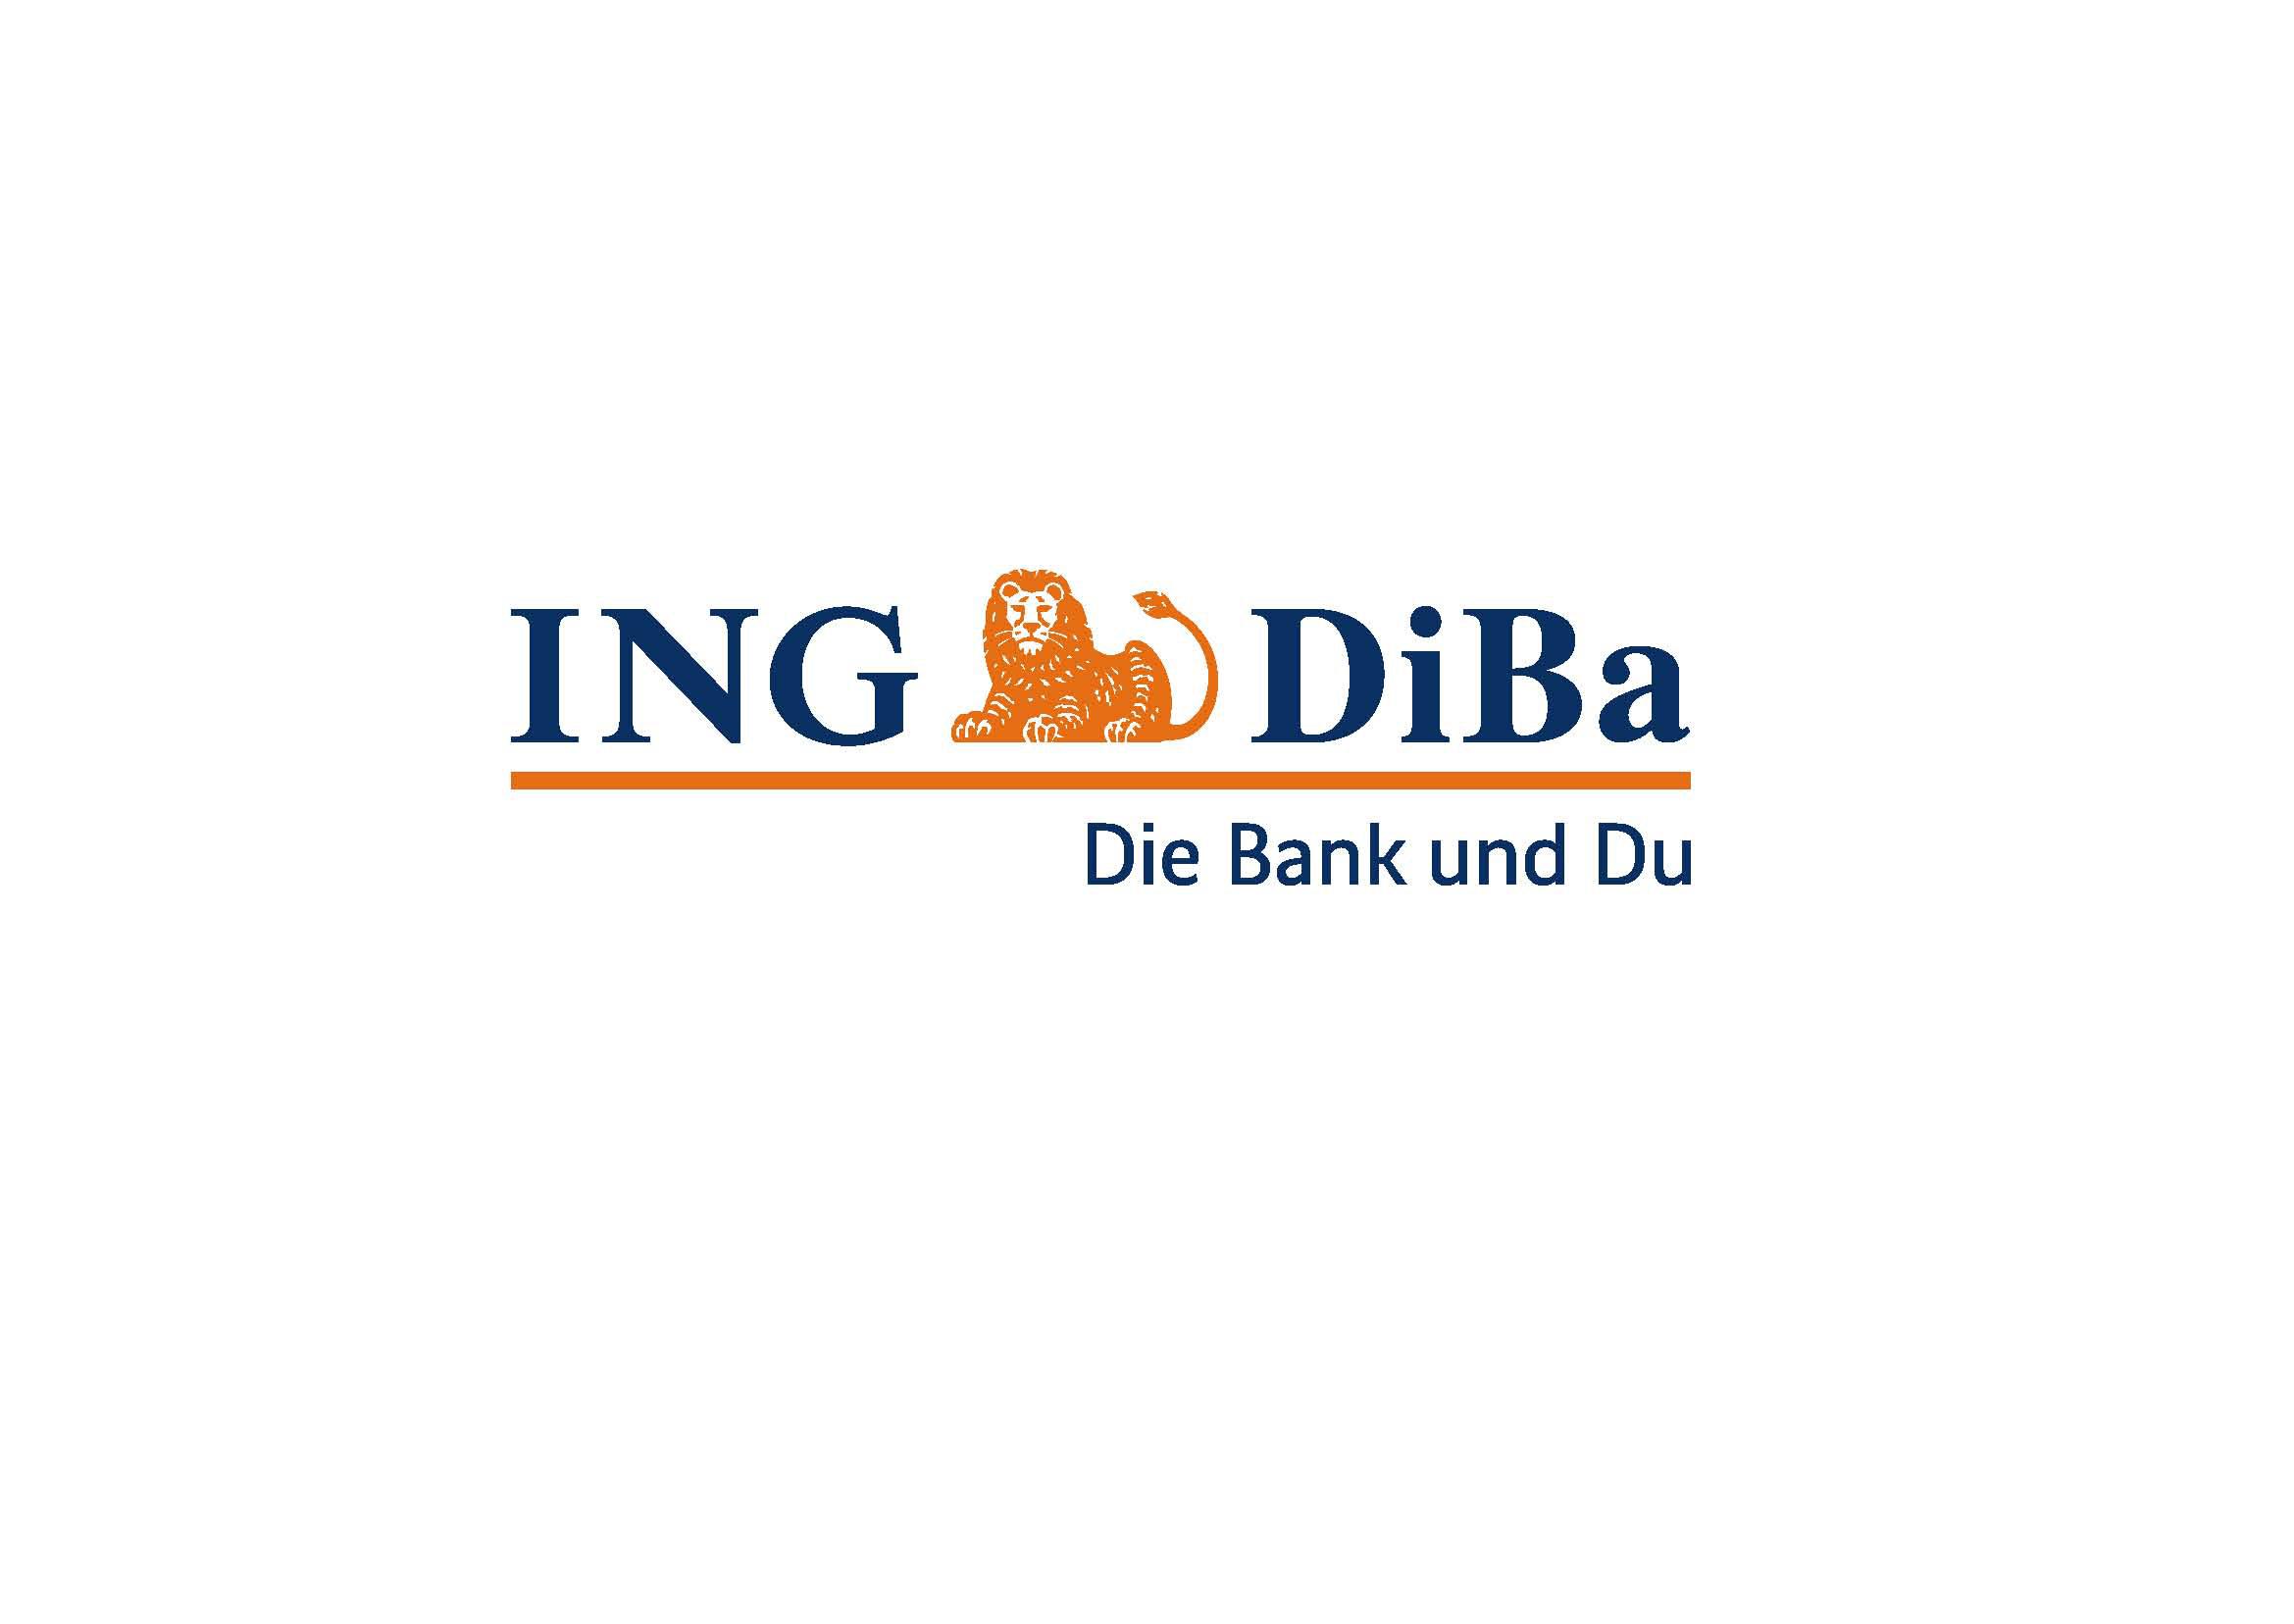 Ing Diba OrdergebГјhren